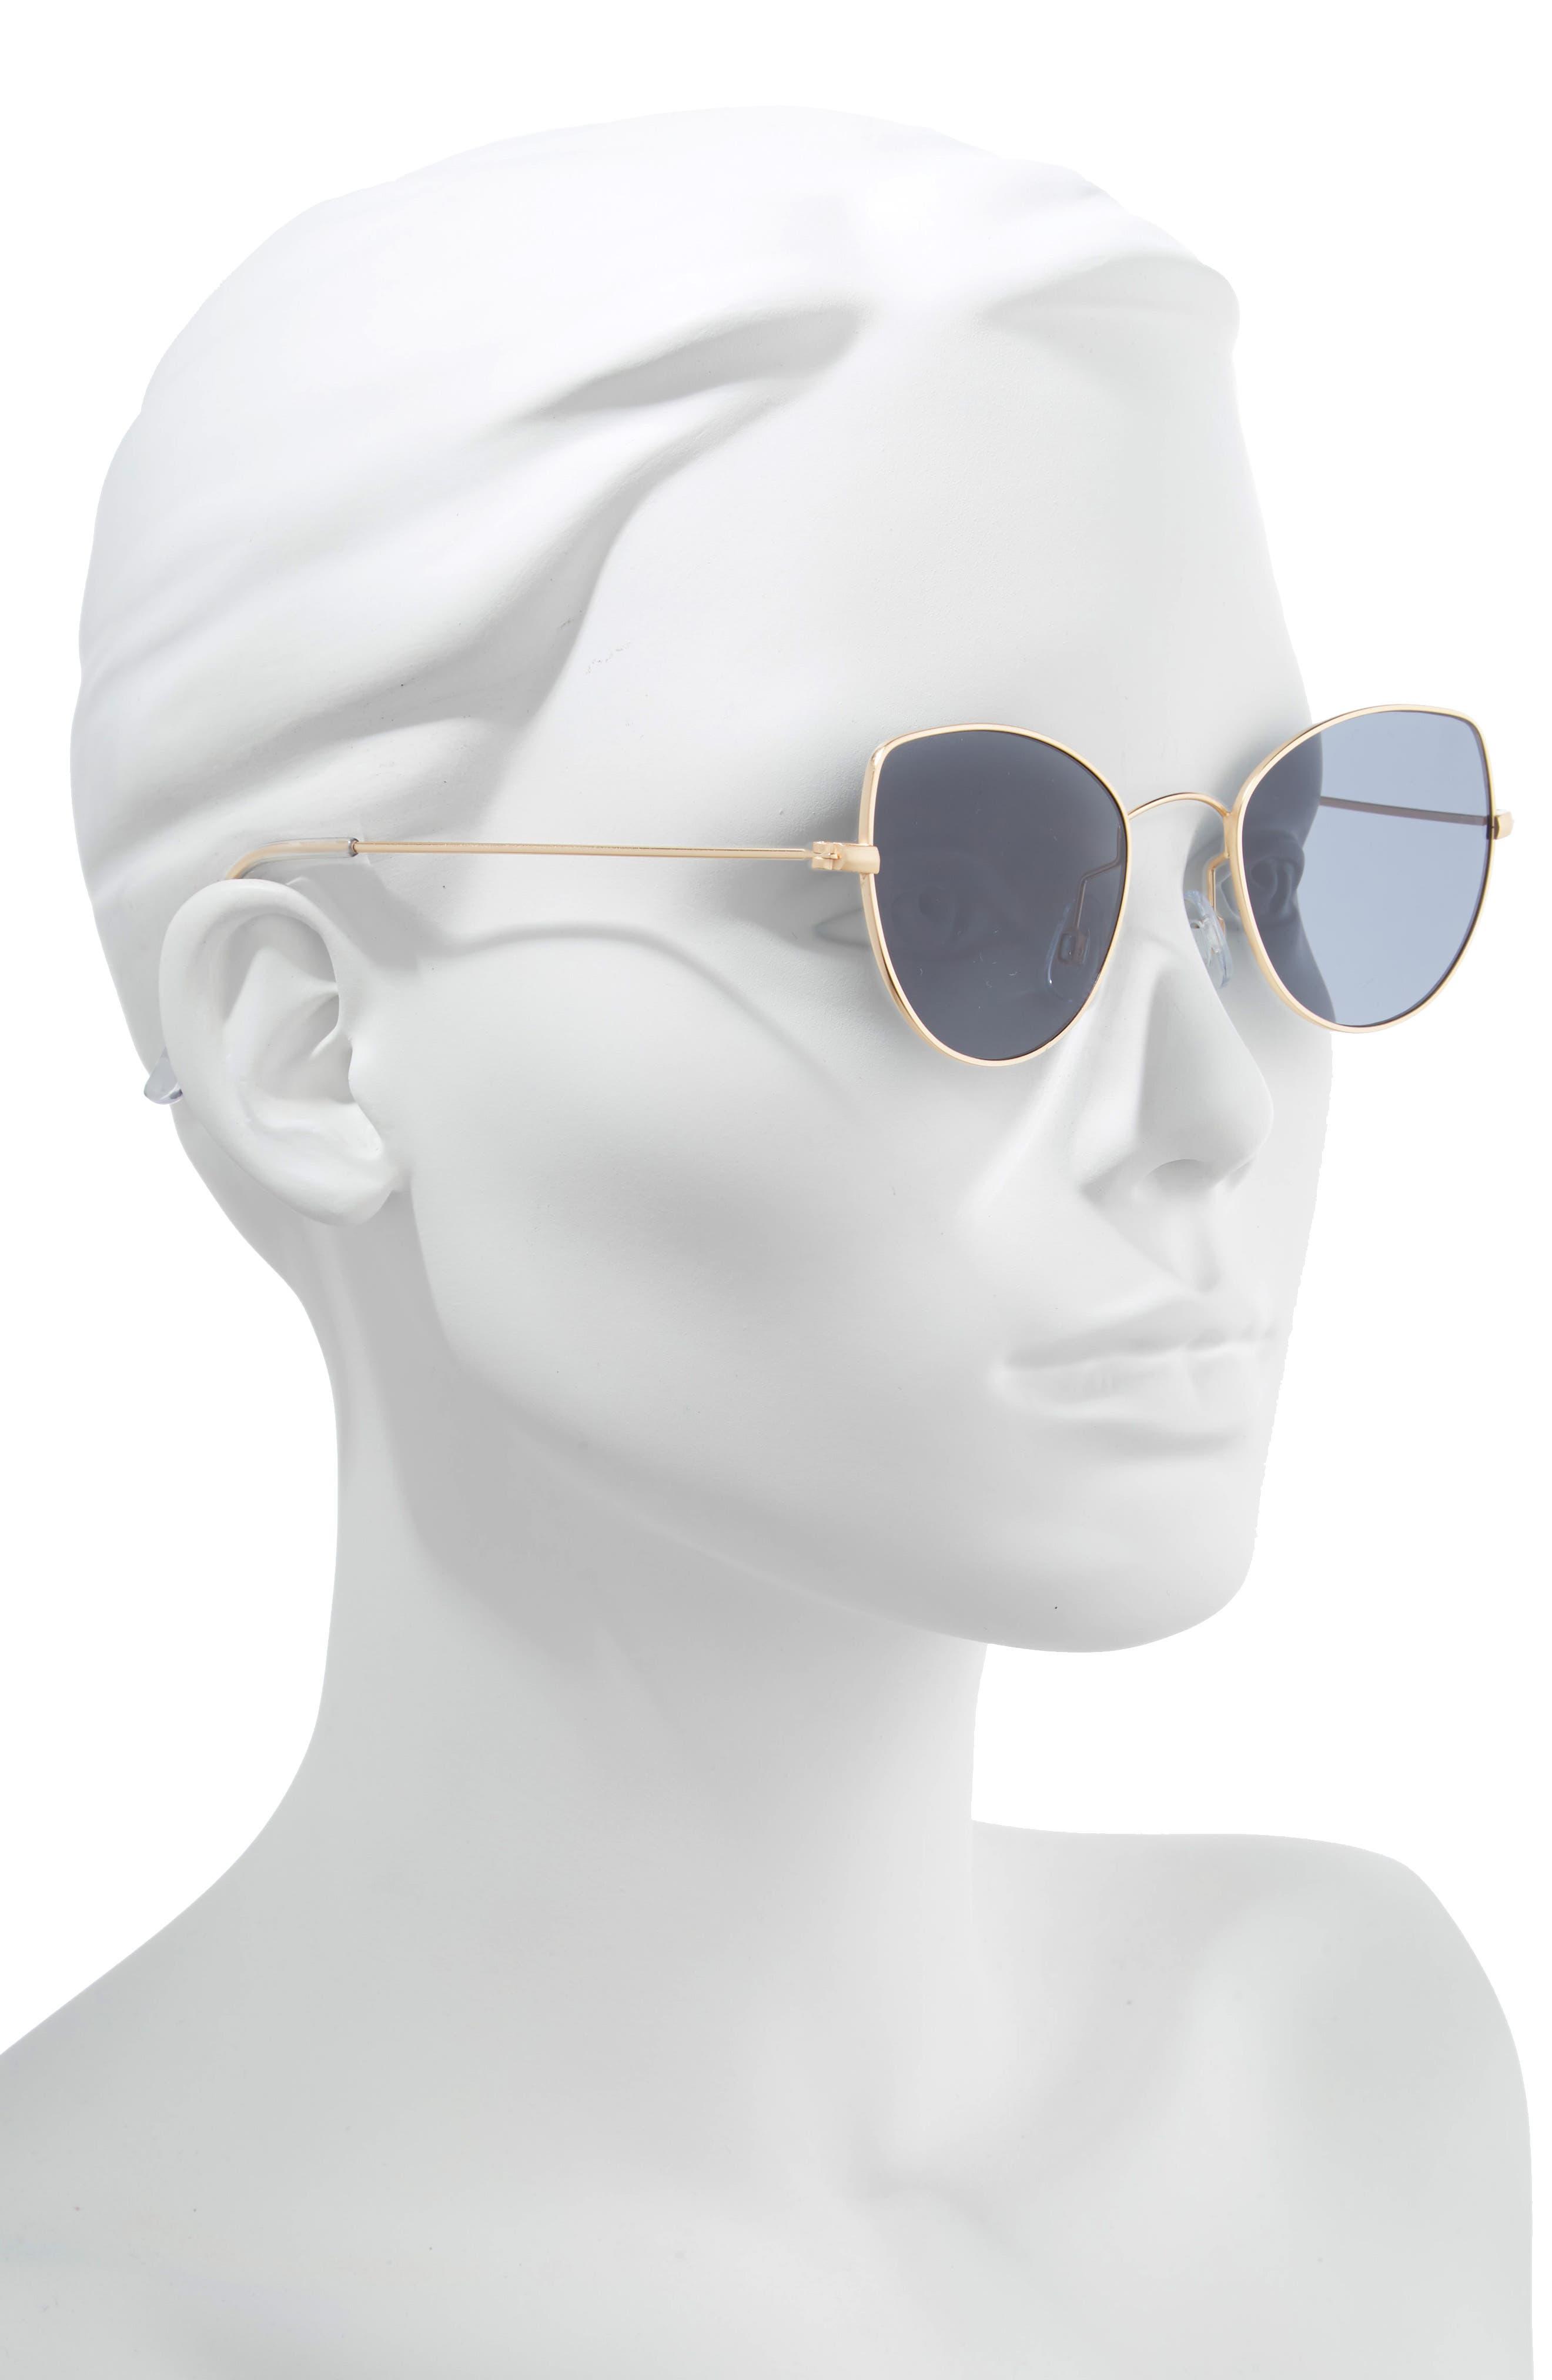 48mm Cat Eye Sunglasses,                             Alternate thumbnail 2, color,                             BLACK/ GOLD